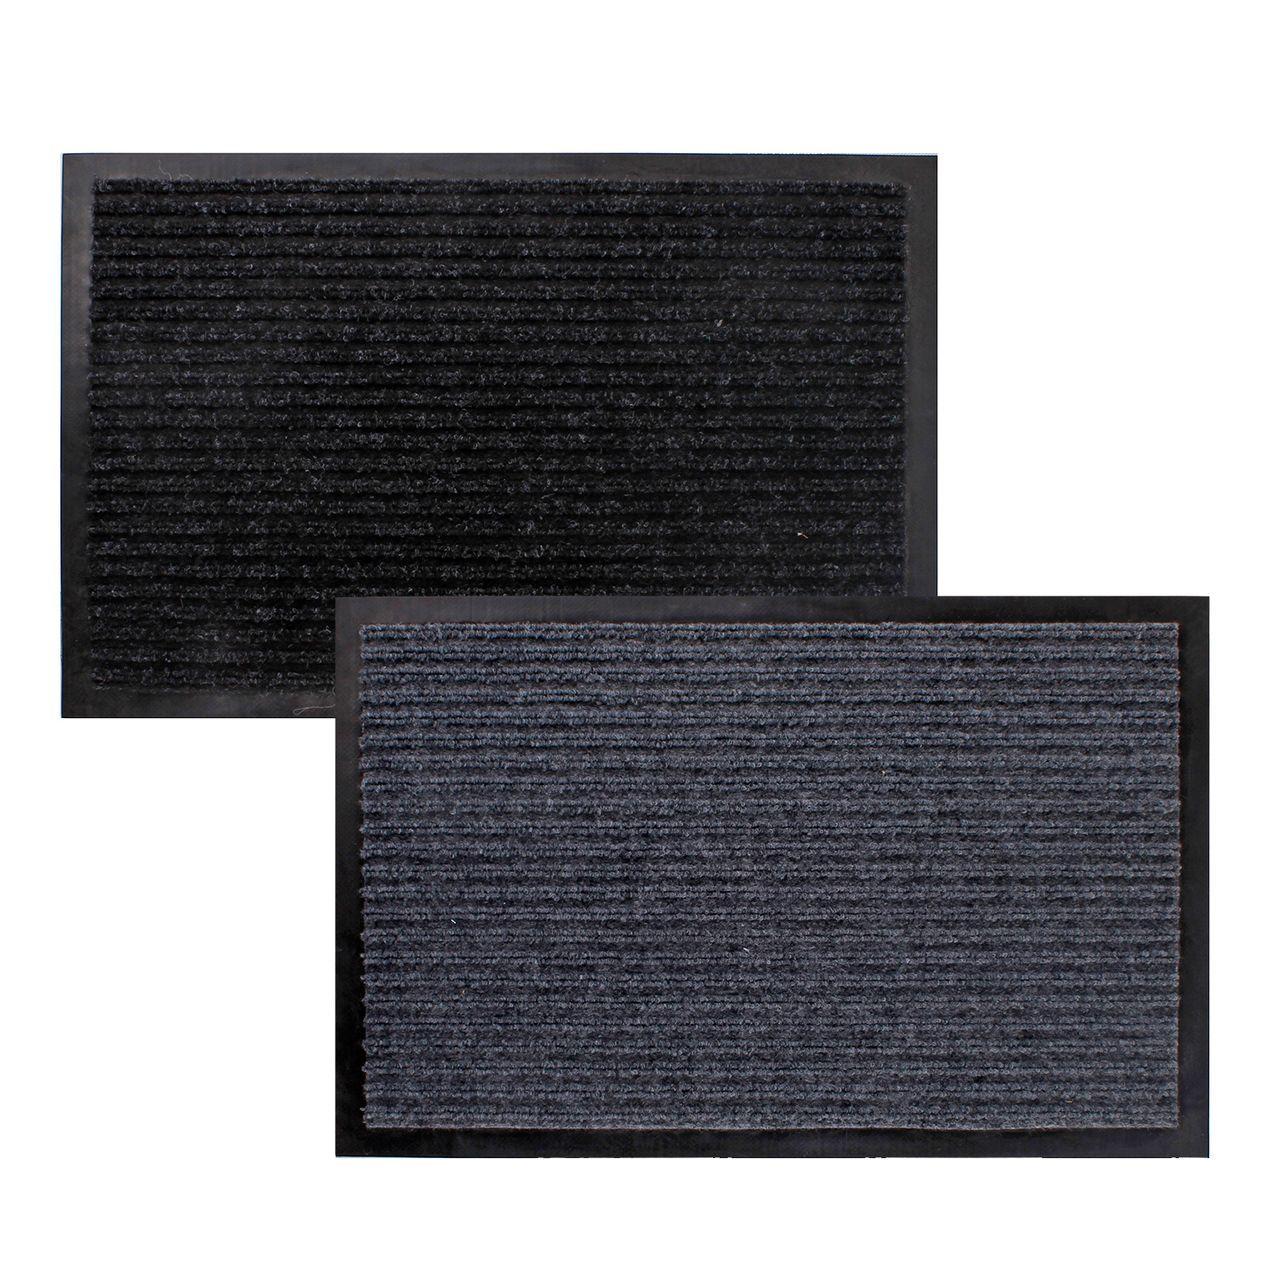 LEX Schmutzfangmatte ca. 180 x 120 cm Schwarz oder Grau